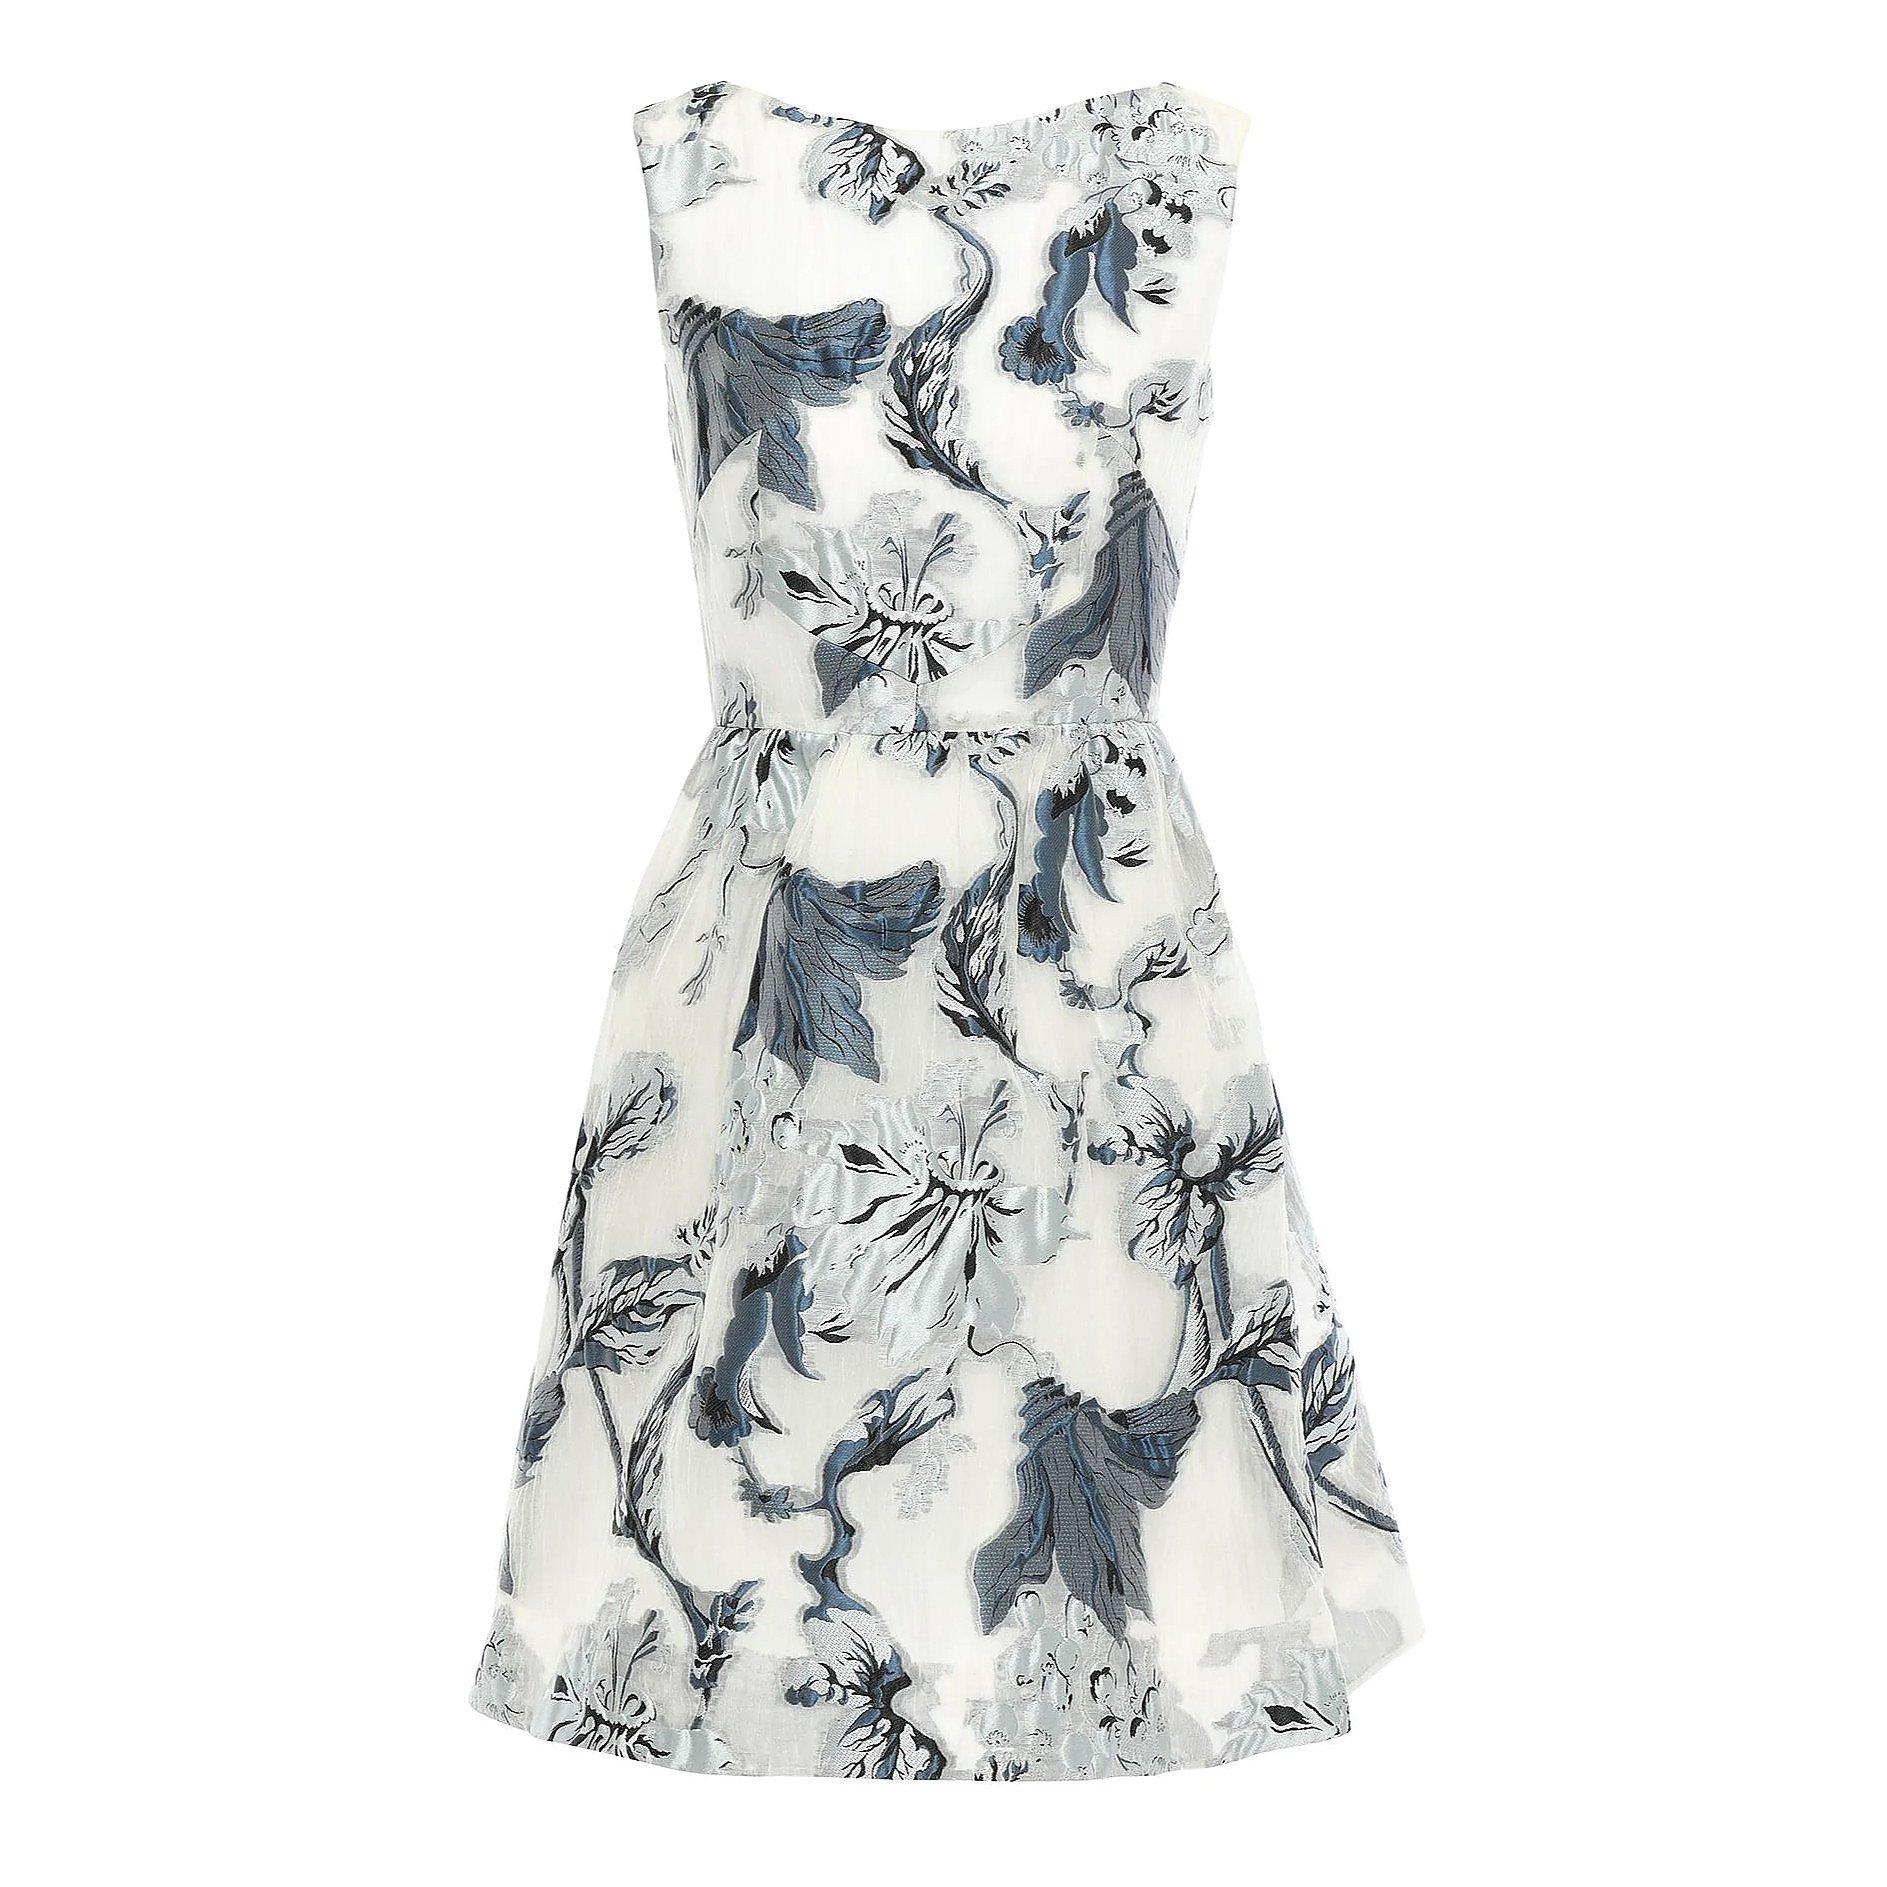 Erdem Sleeveless Metallic Fil Coupé Organza Mini Dress